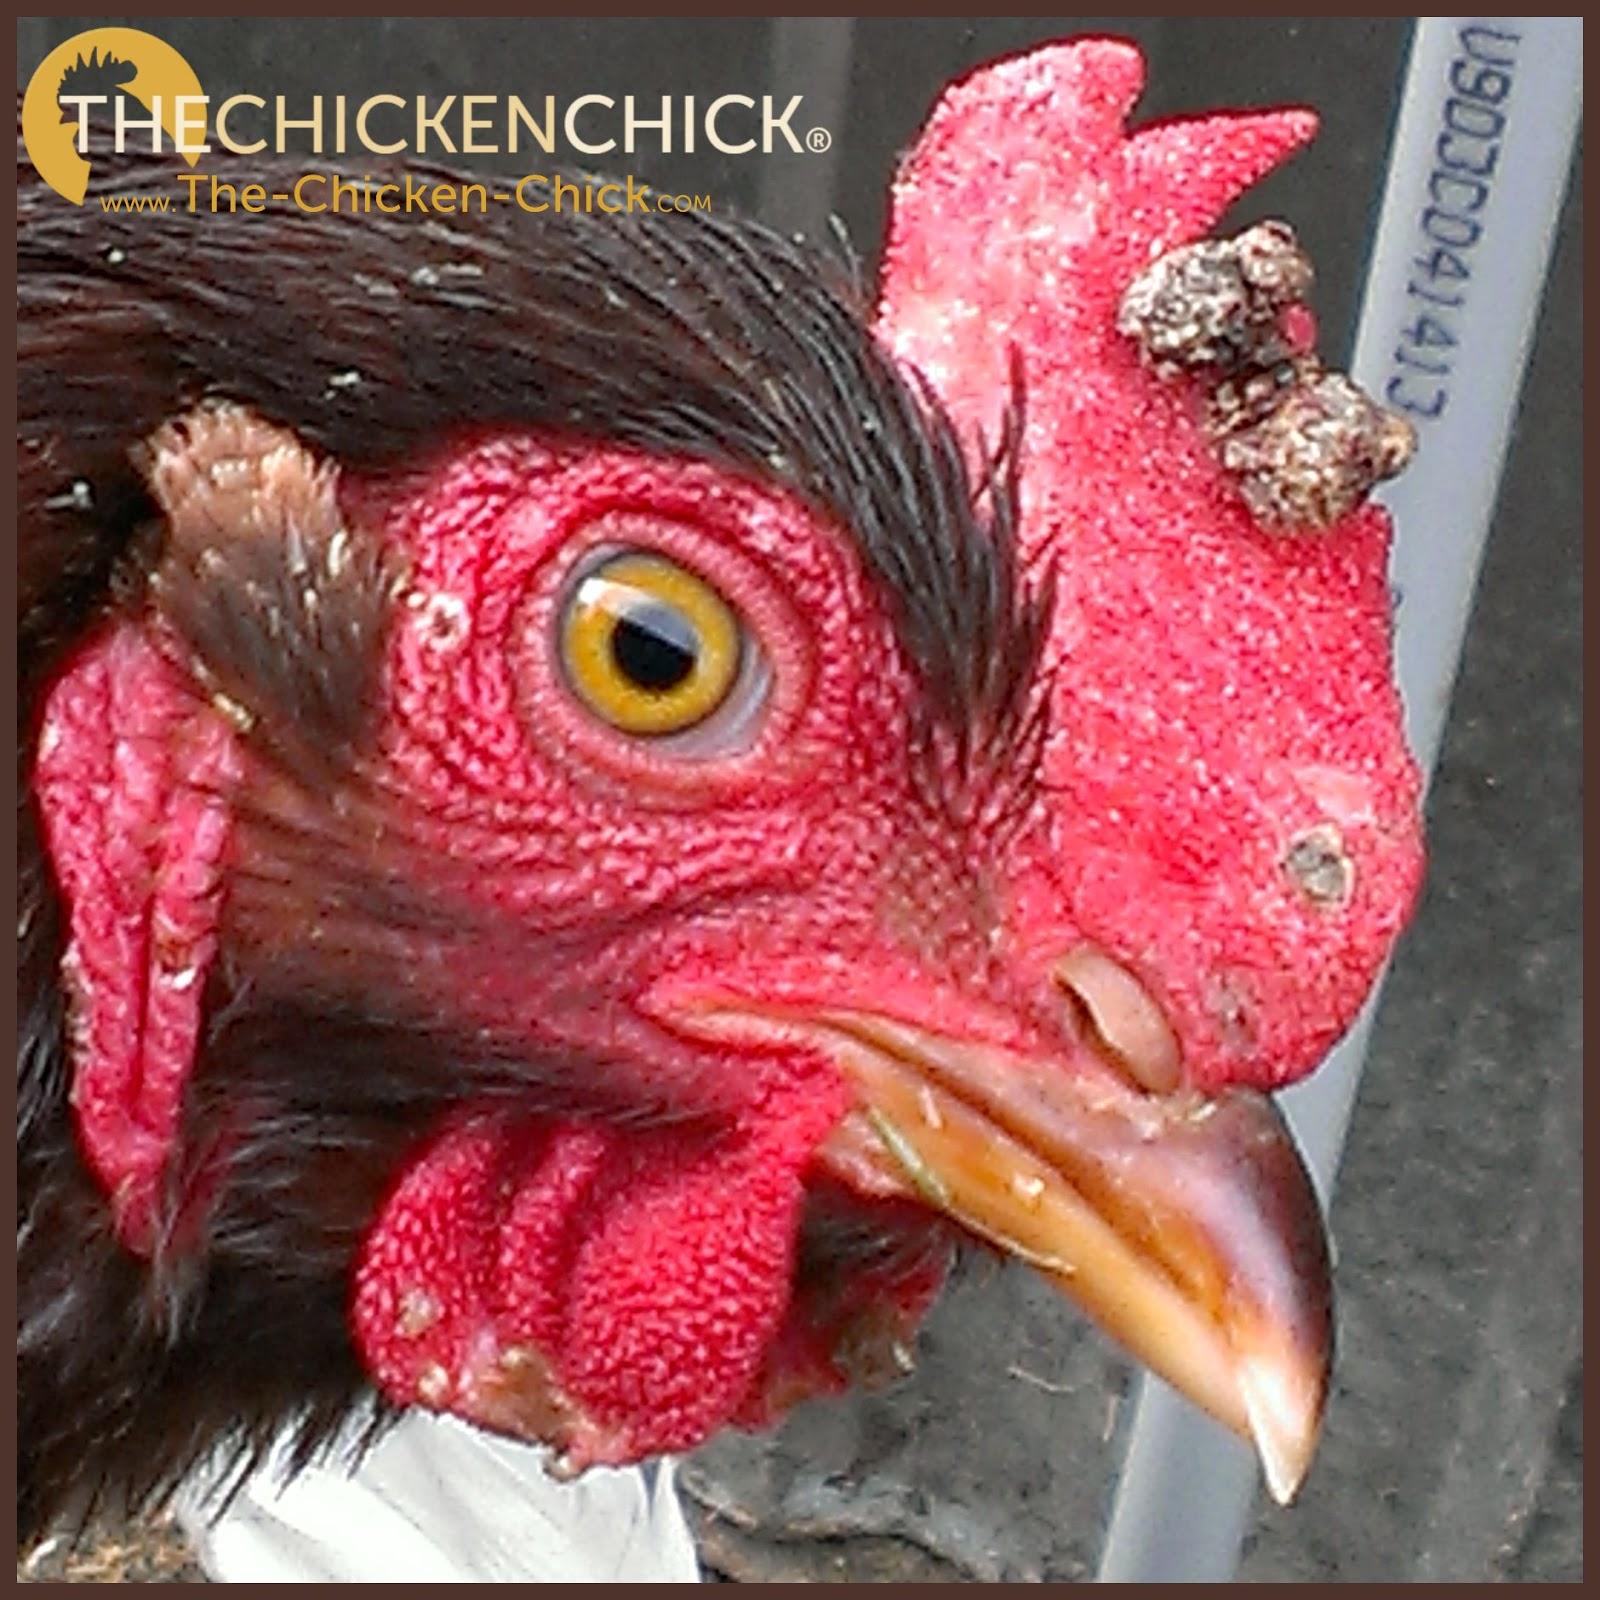 how to tell if u got chicken pox